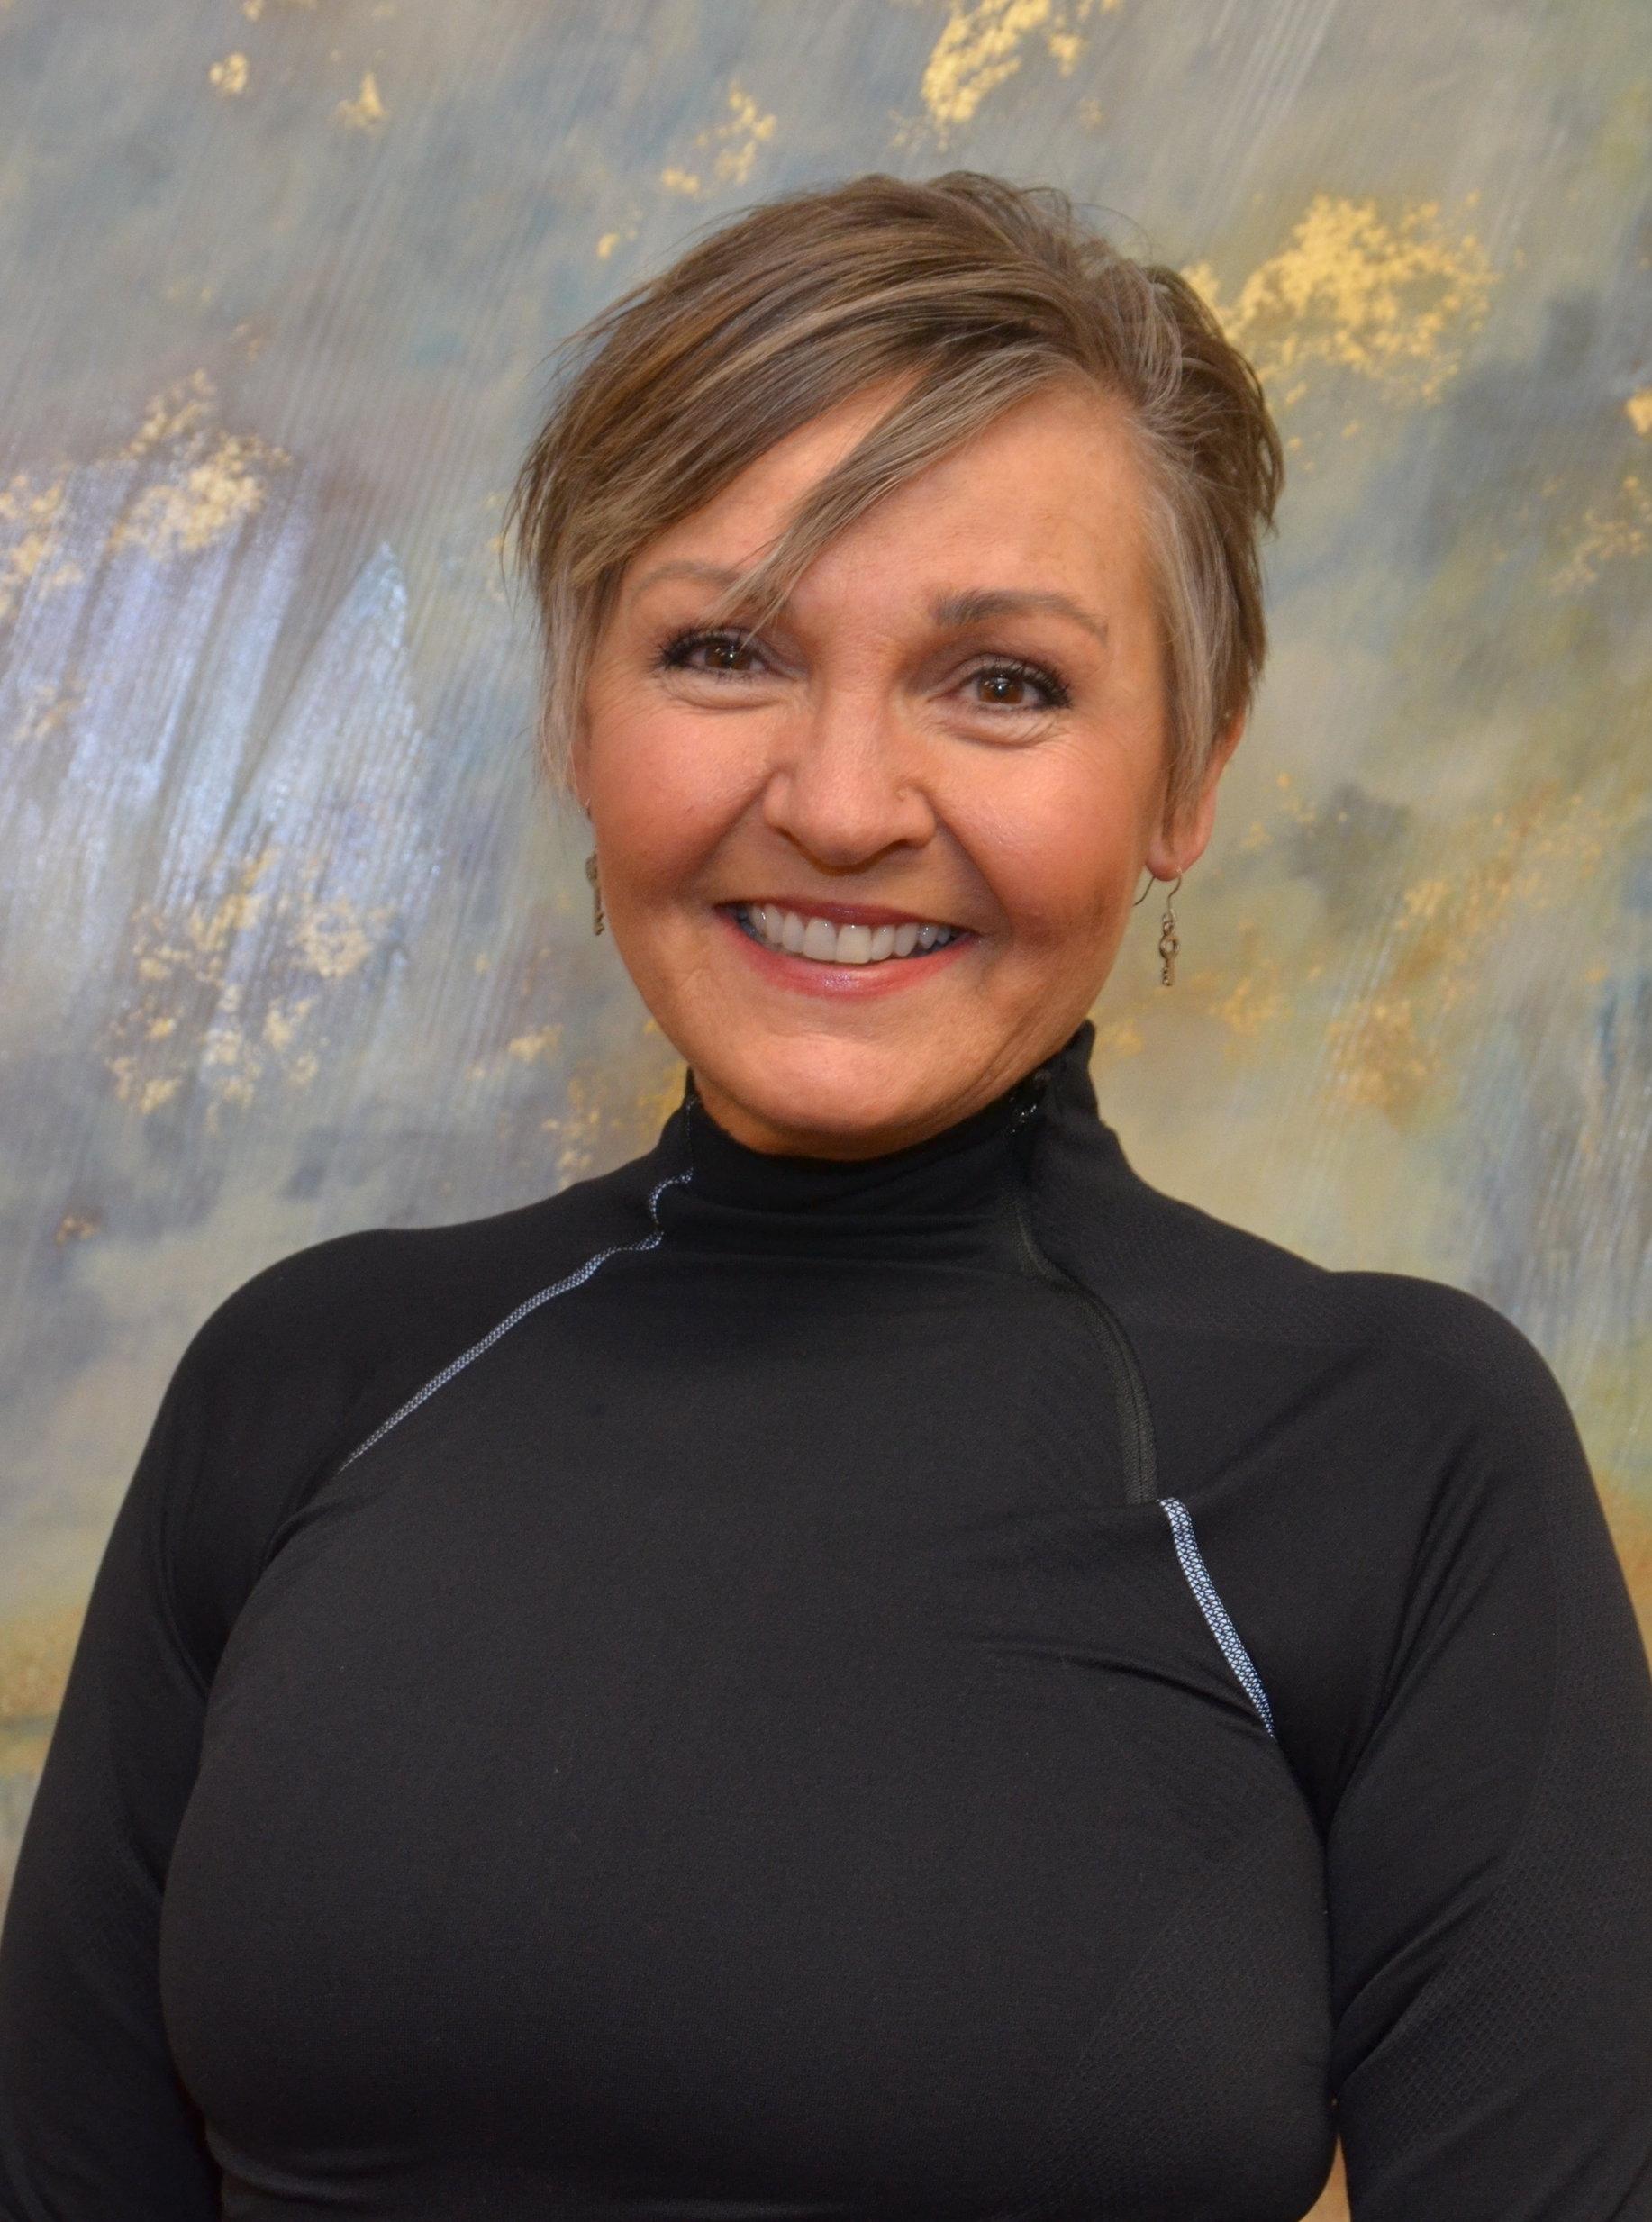 Leslie Patterson-Lynn